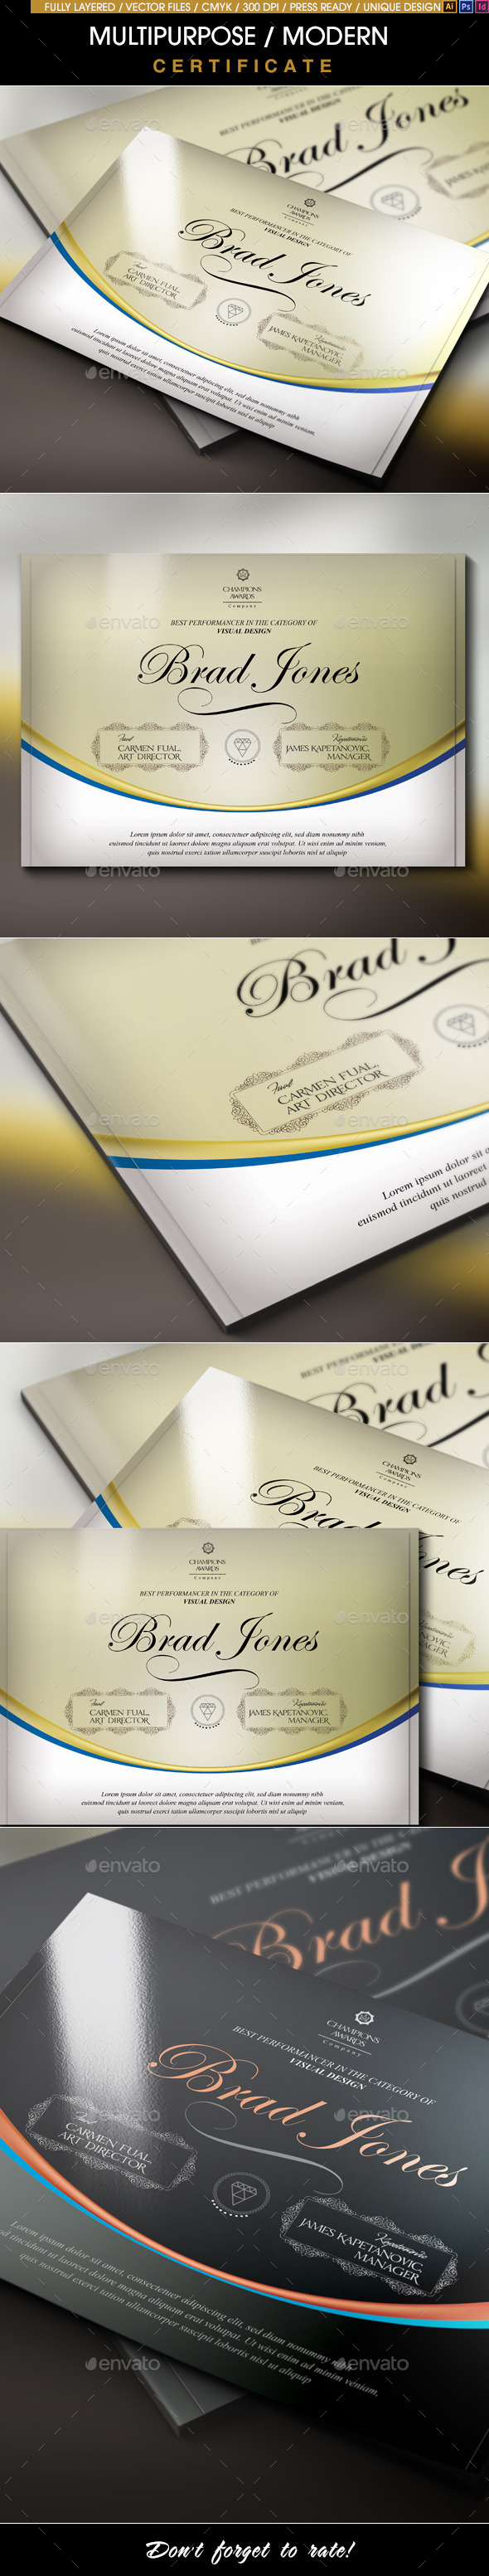 Multipurpose Modern Certificate v.6 (All Formats) - Certificates Stationery